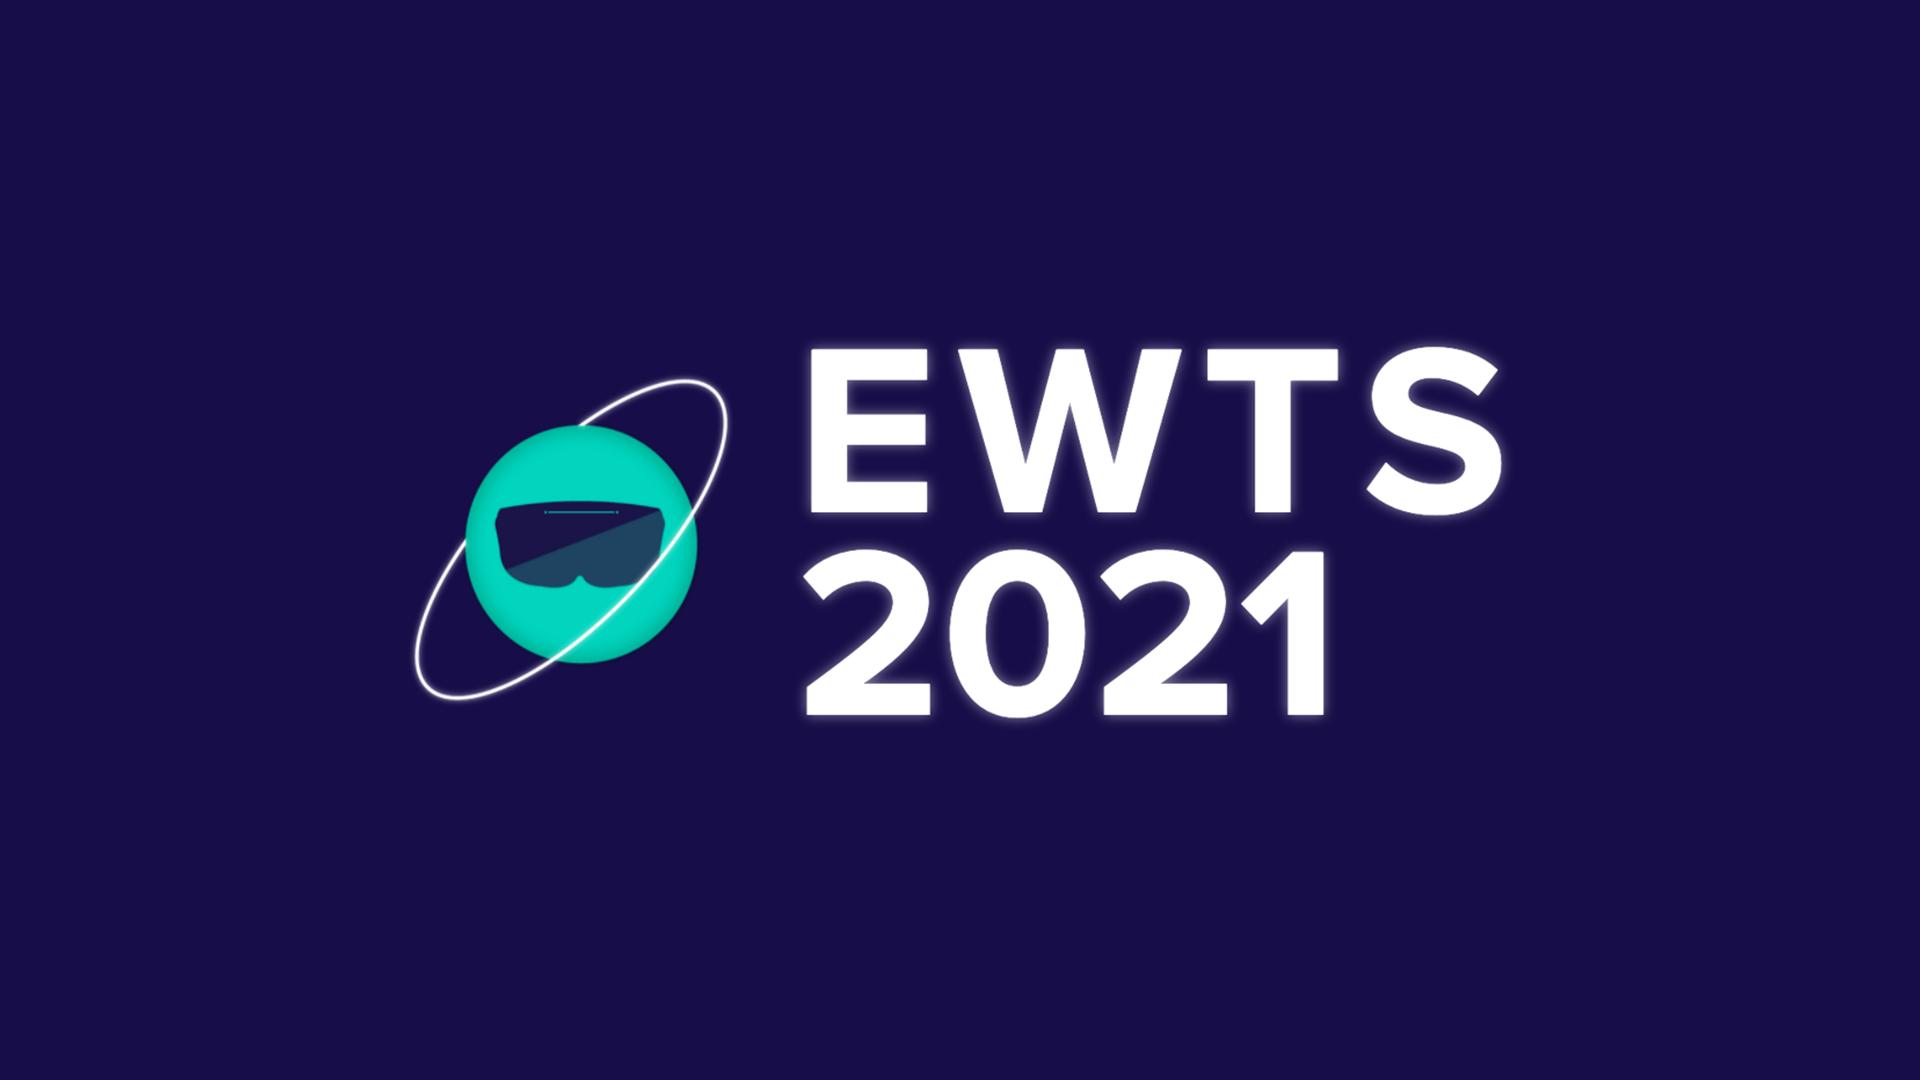 EWTS 2021